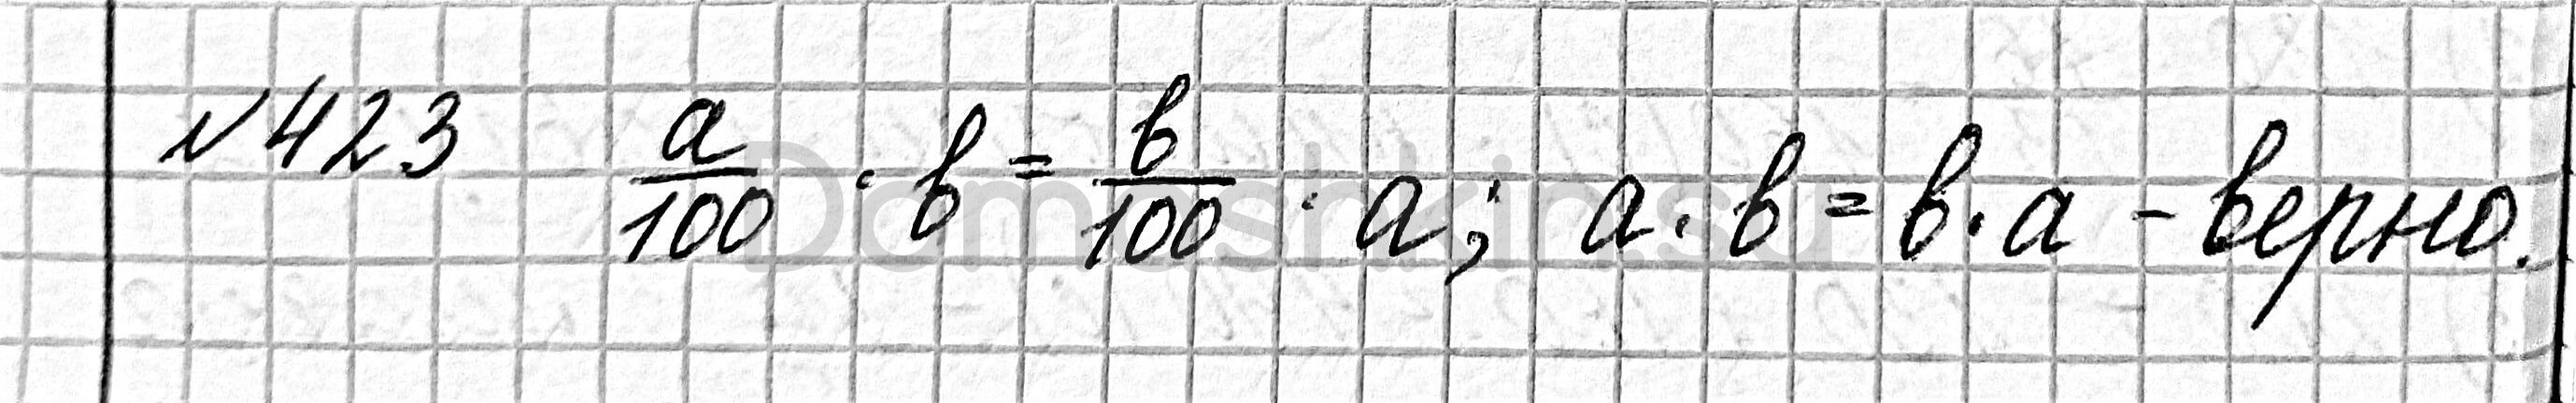 Математика 6 класс учебник Мерзляк номер 423 решение